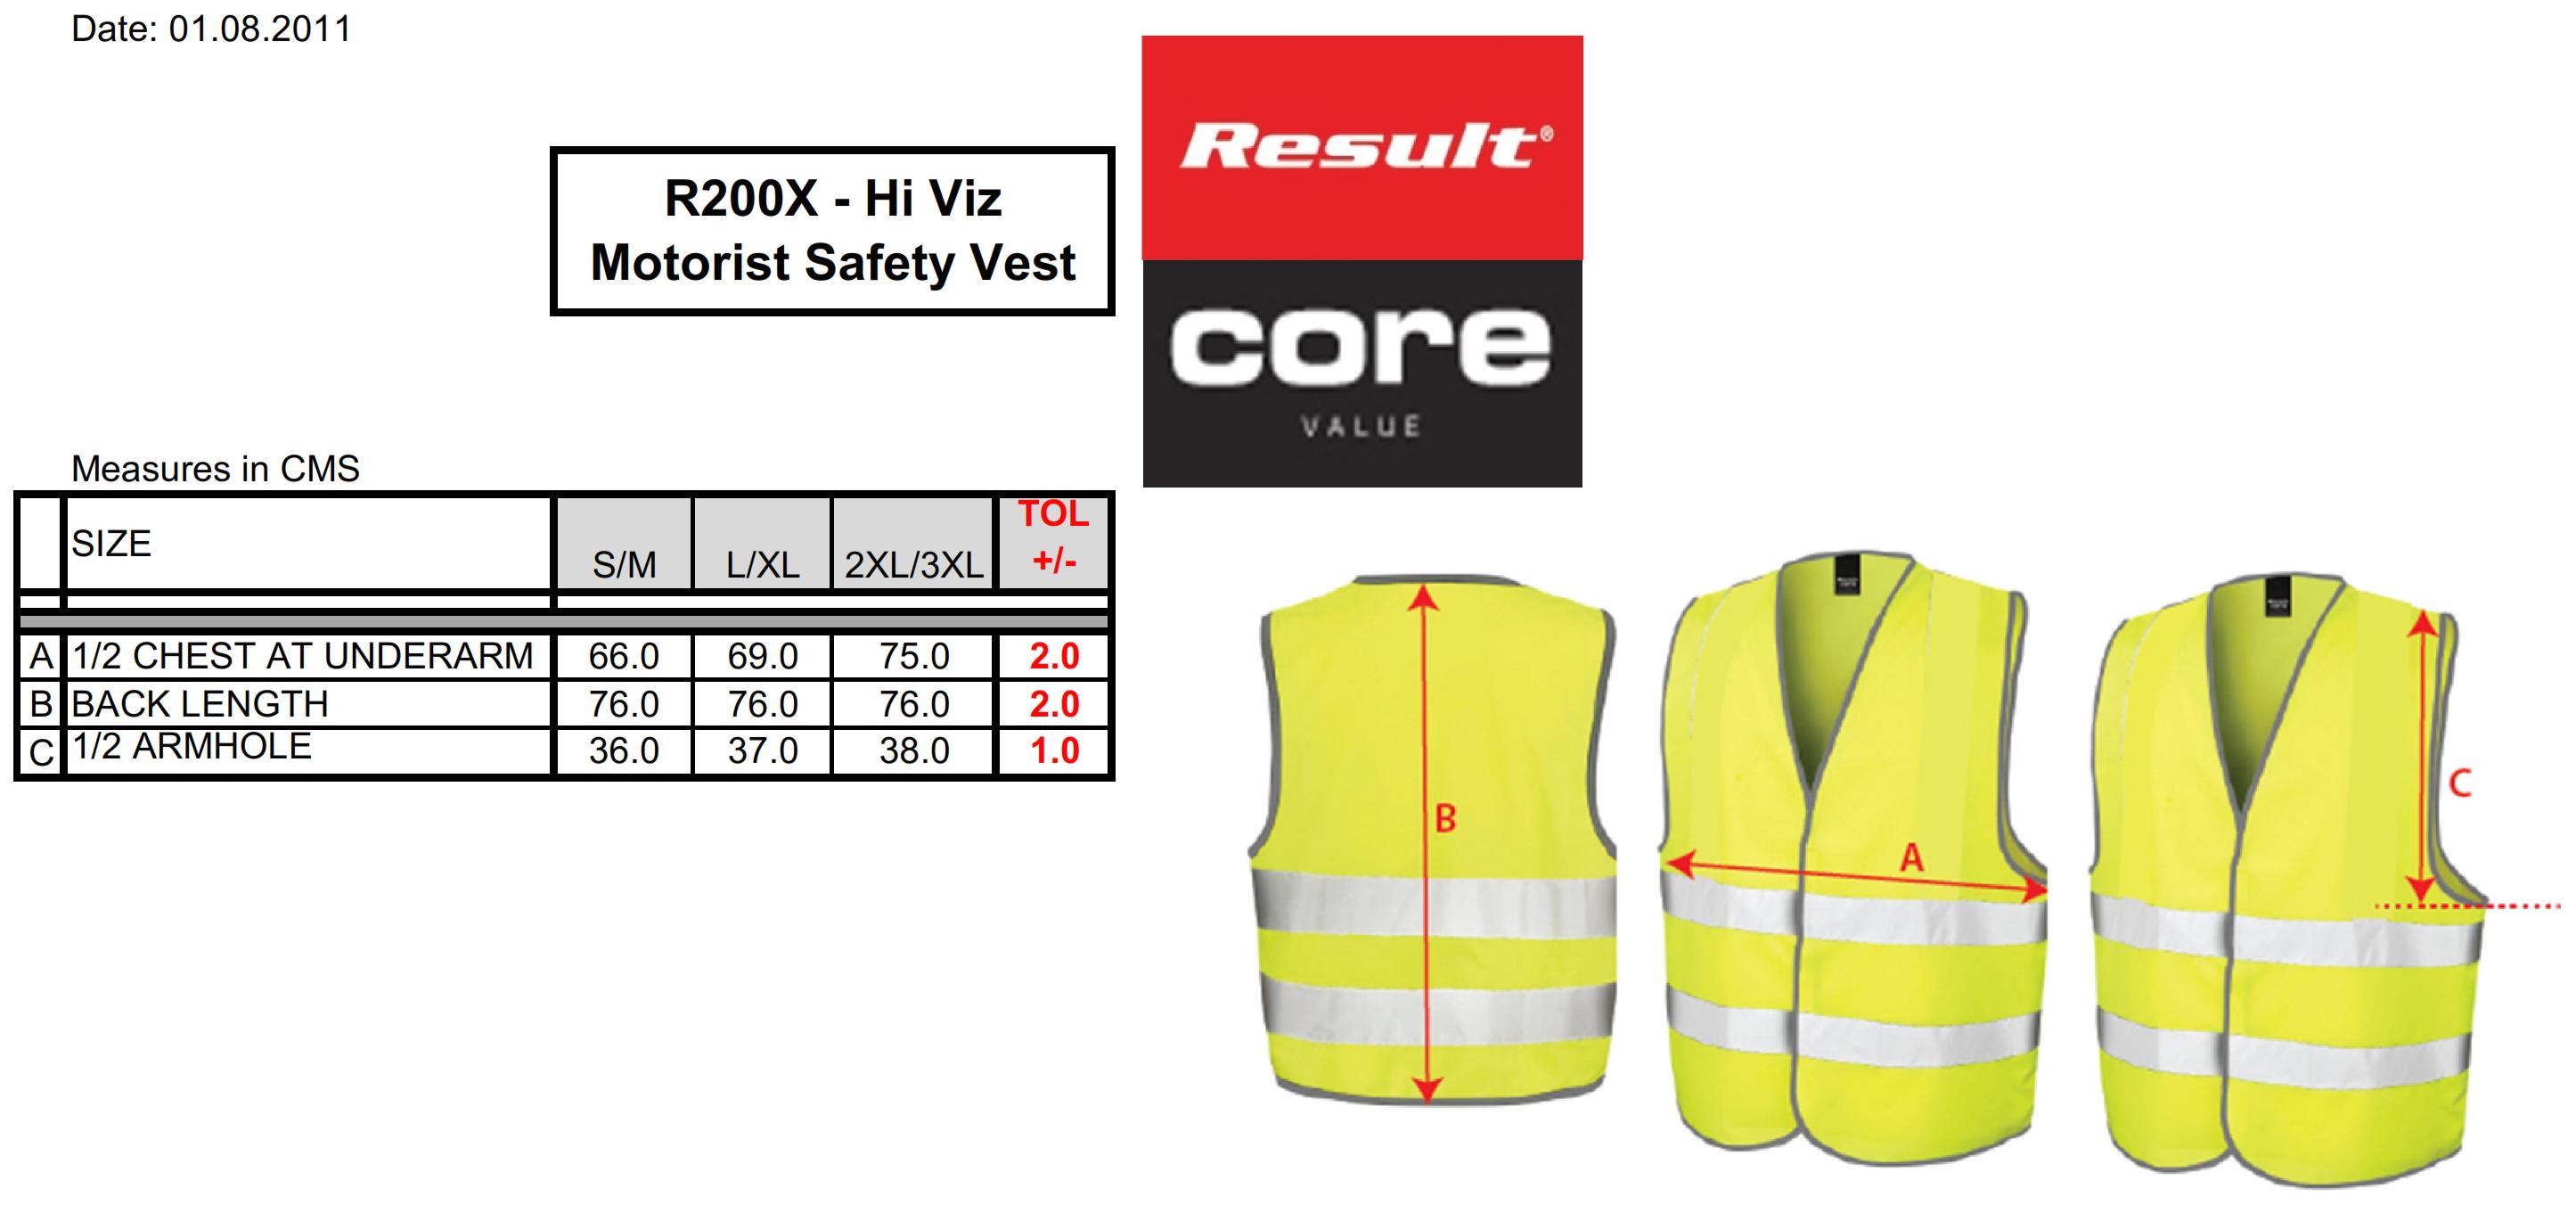 Result: Core Motorist Safety Vest R200X